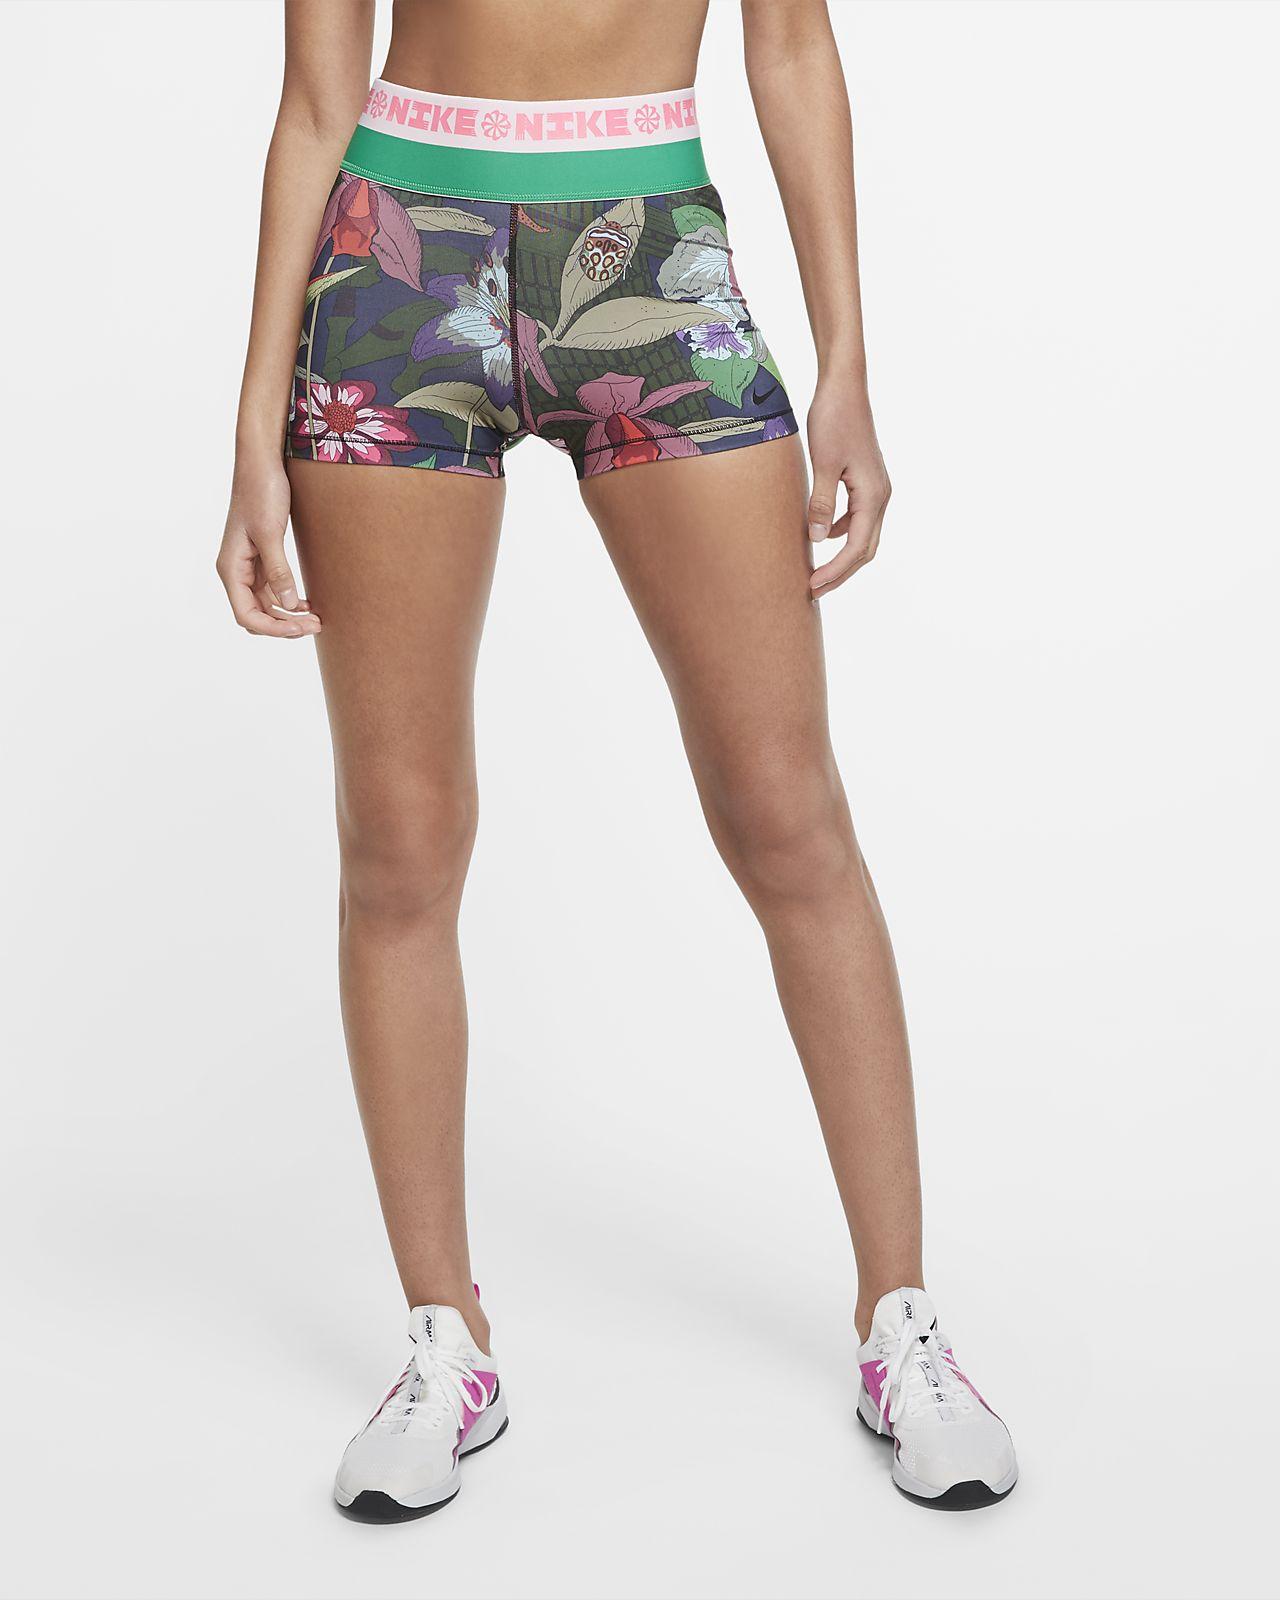 Nike Icon Clash Damen-Trainingsshorts mit Print (ca. 8 cm)